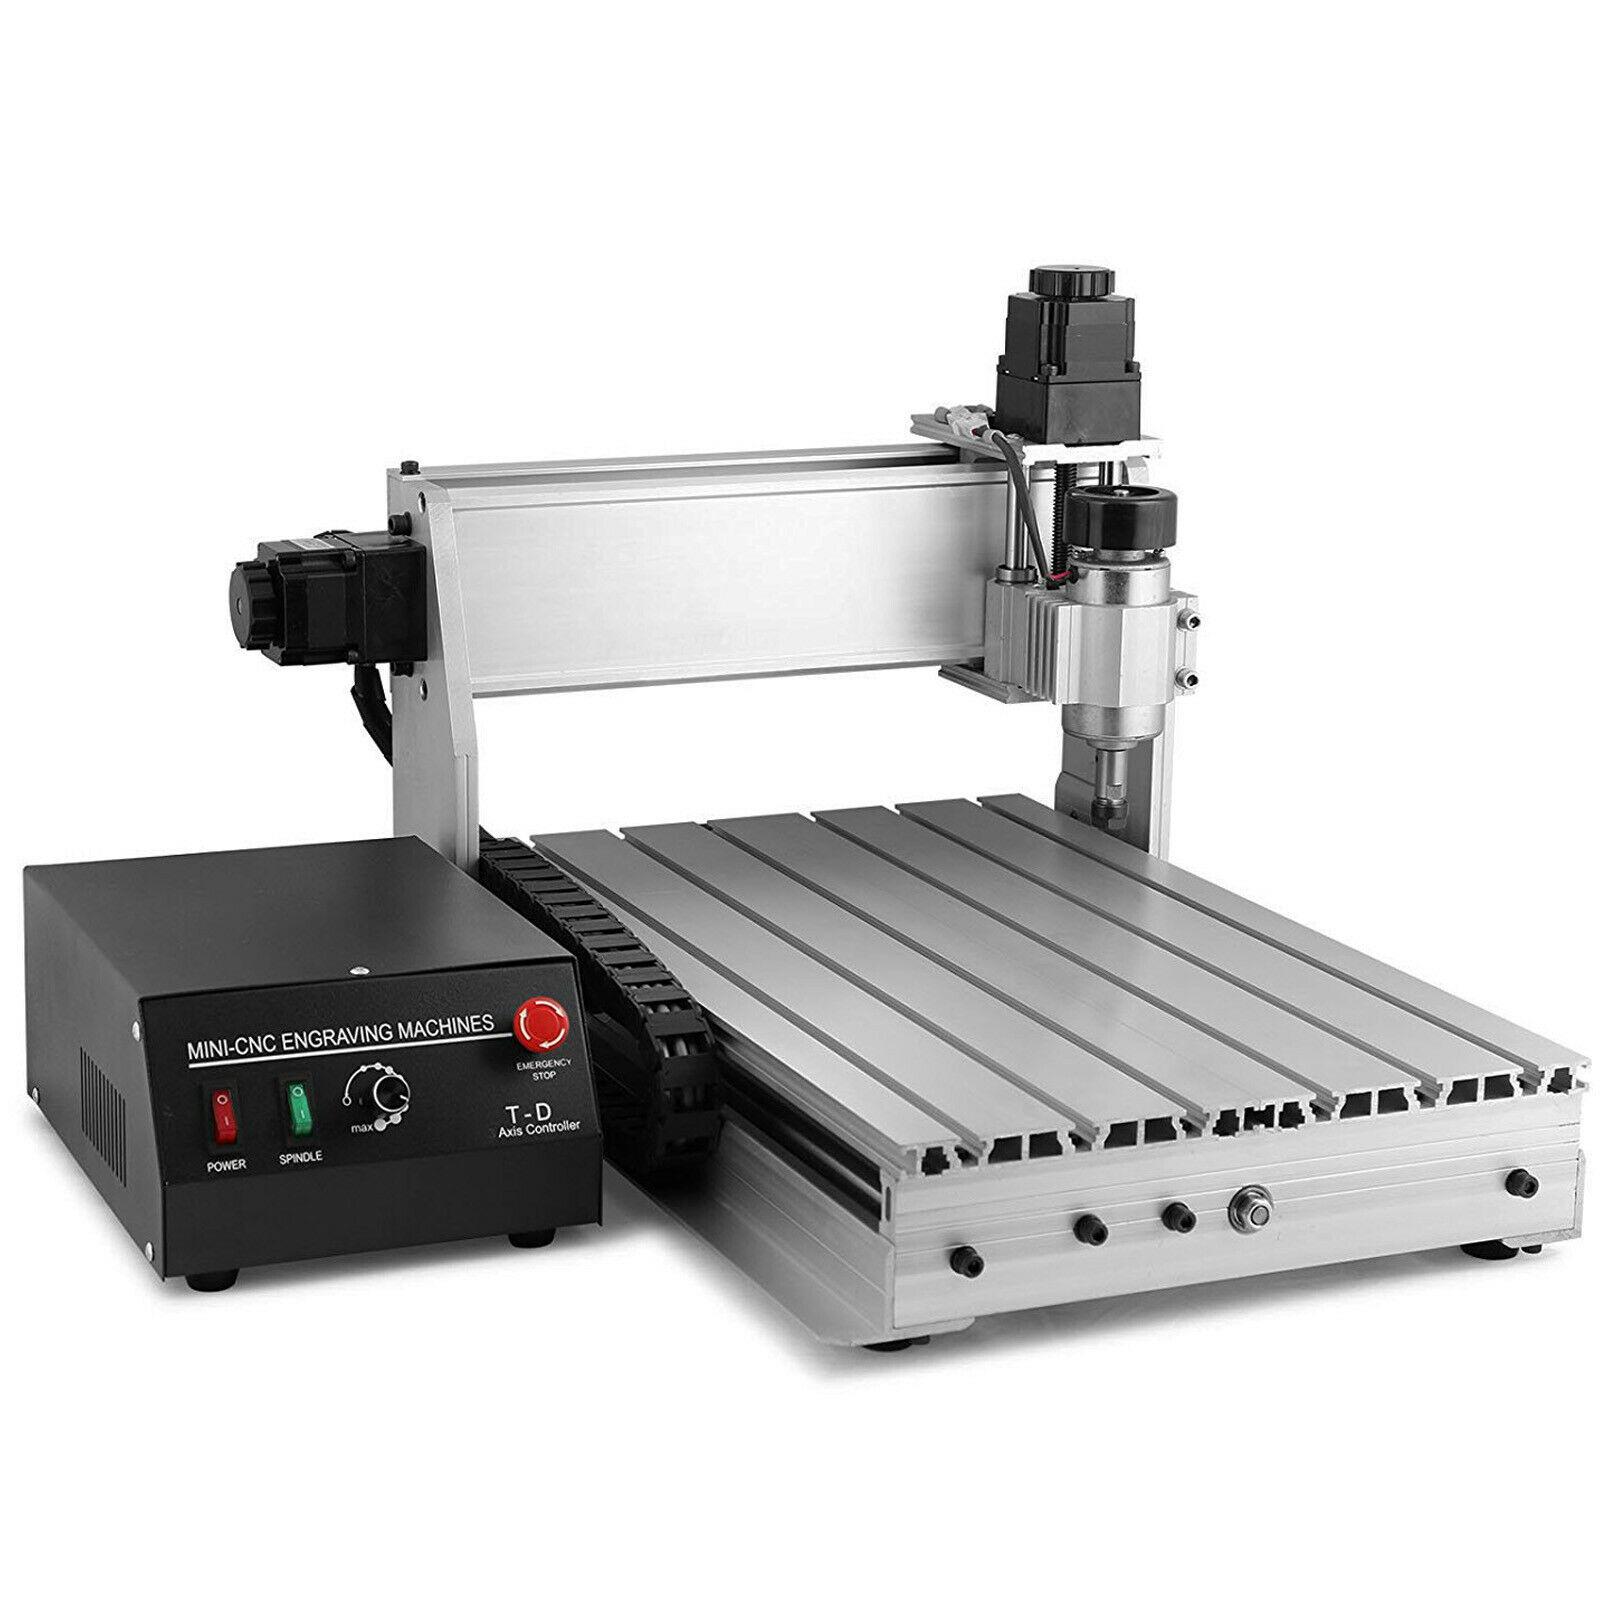 CNC Router Case Engraving Machine Engraver T-SCREW 3040T 4 Axis Desktop Wood Carving DIY Craft Cutter Home Appliance Cut Machine